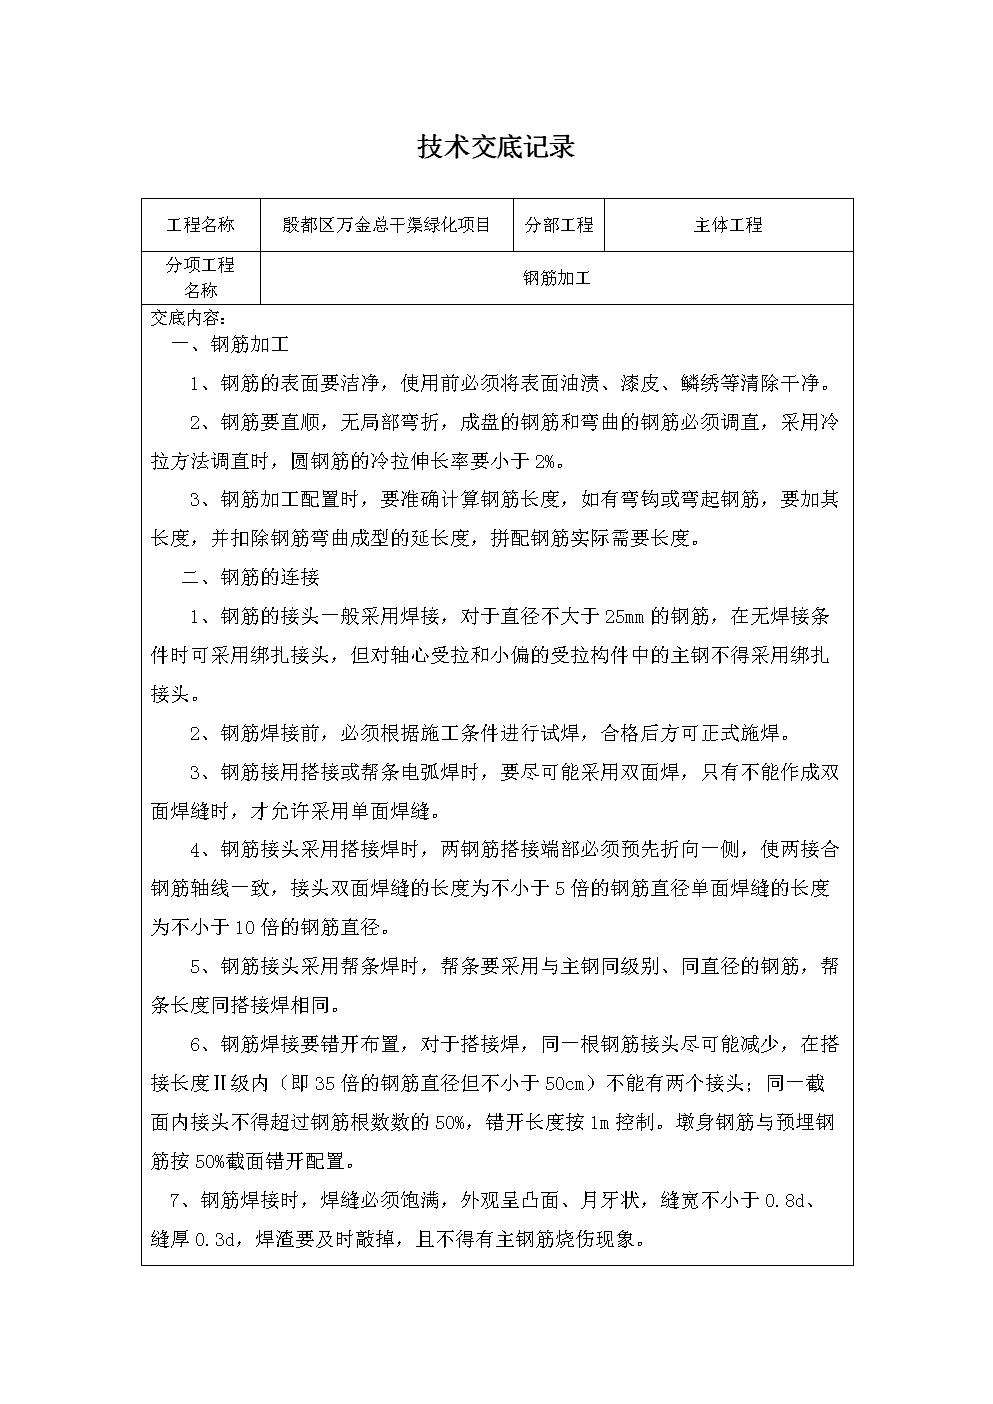 2钢筋加工技术交底.doc